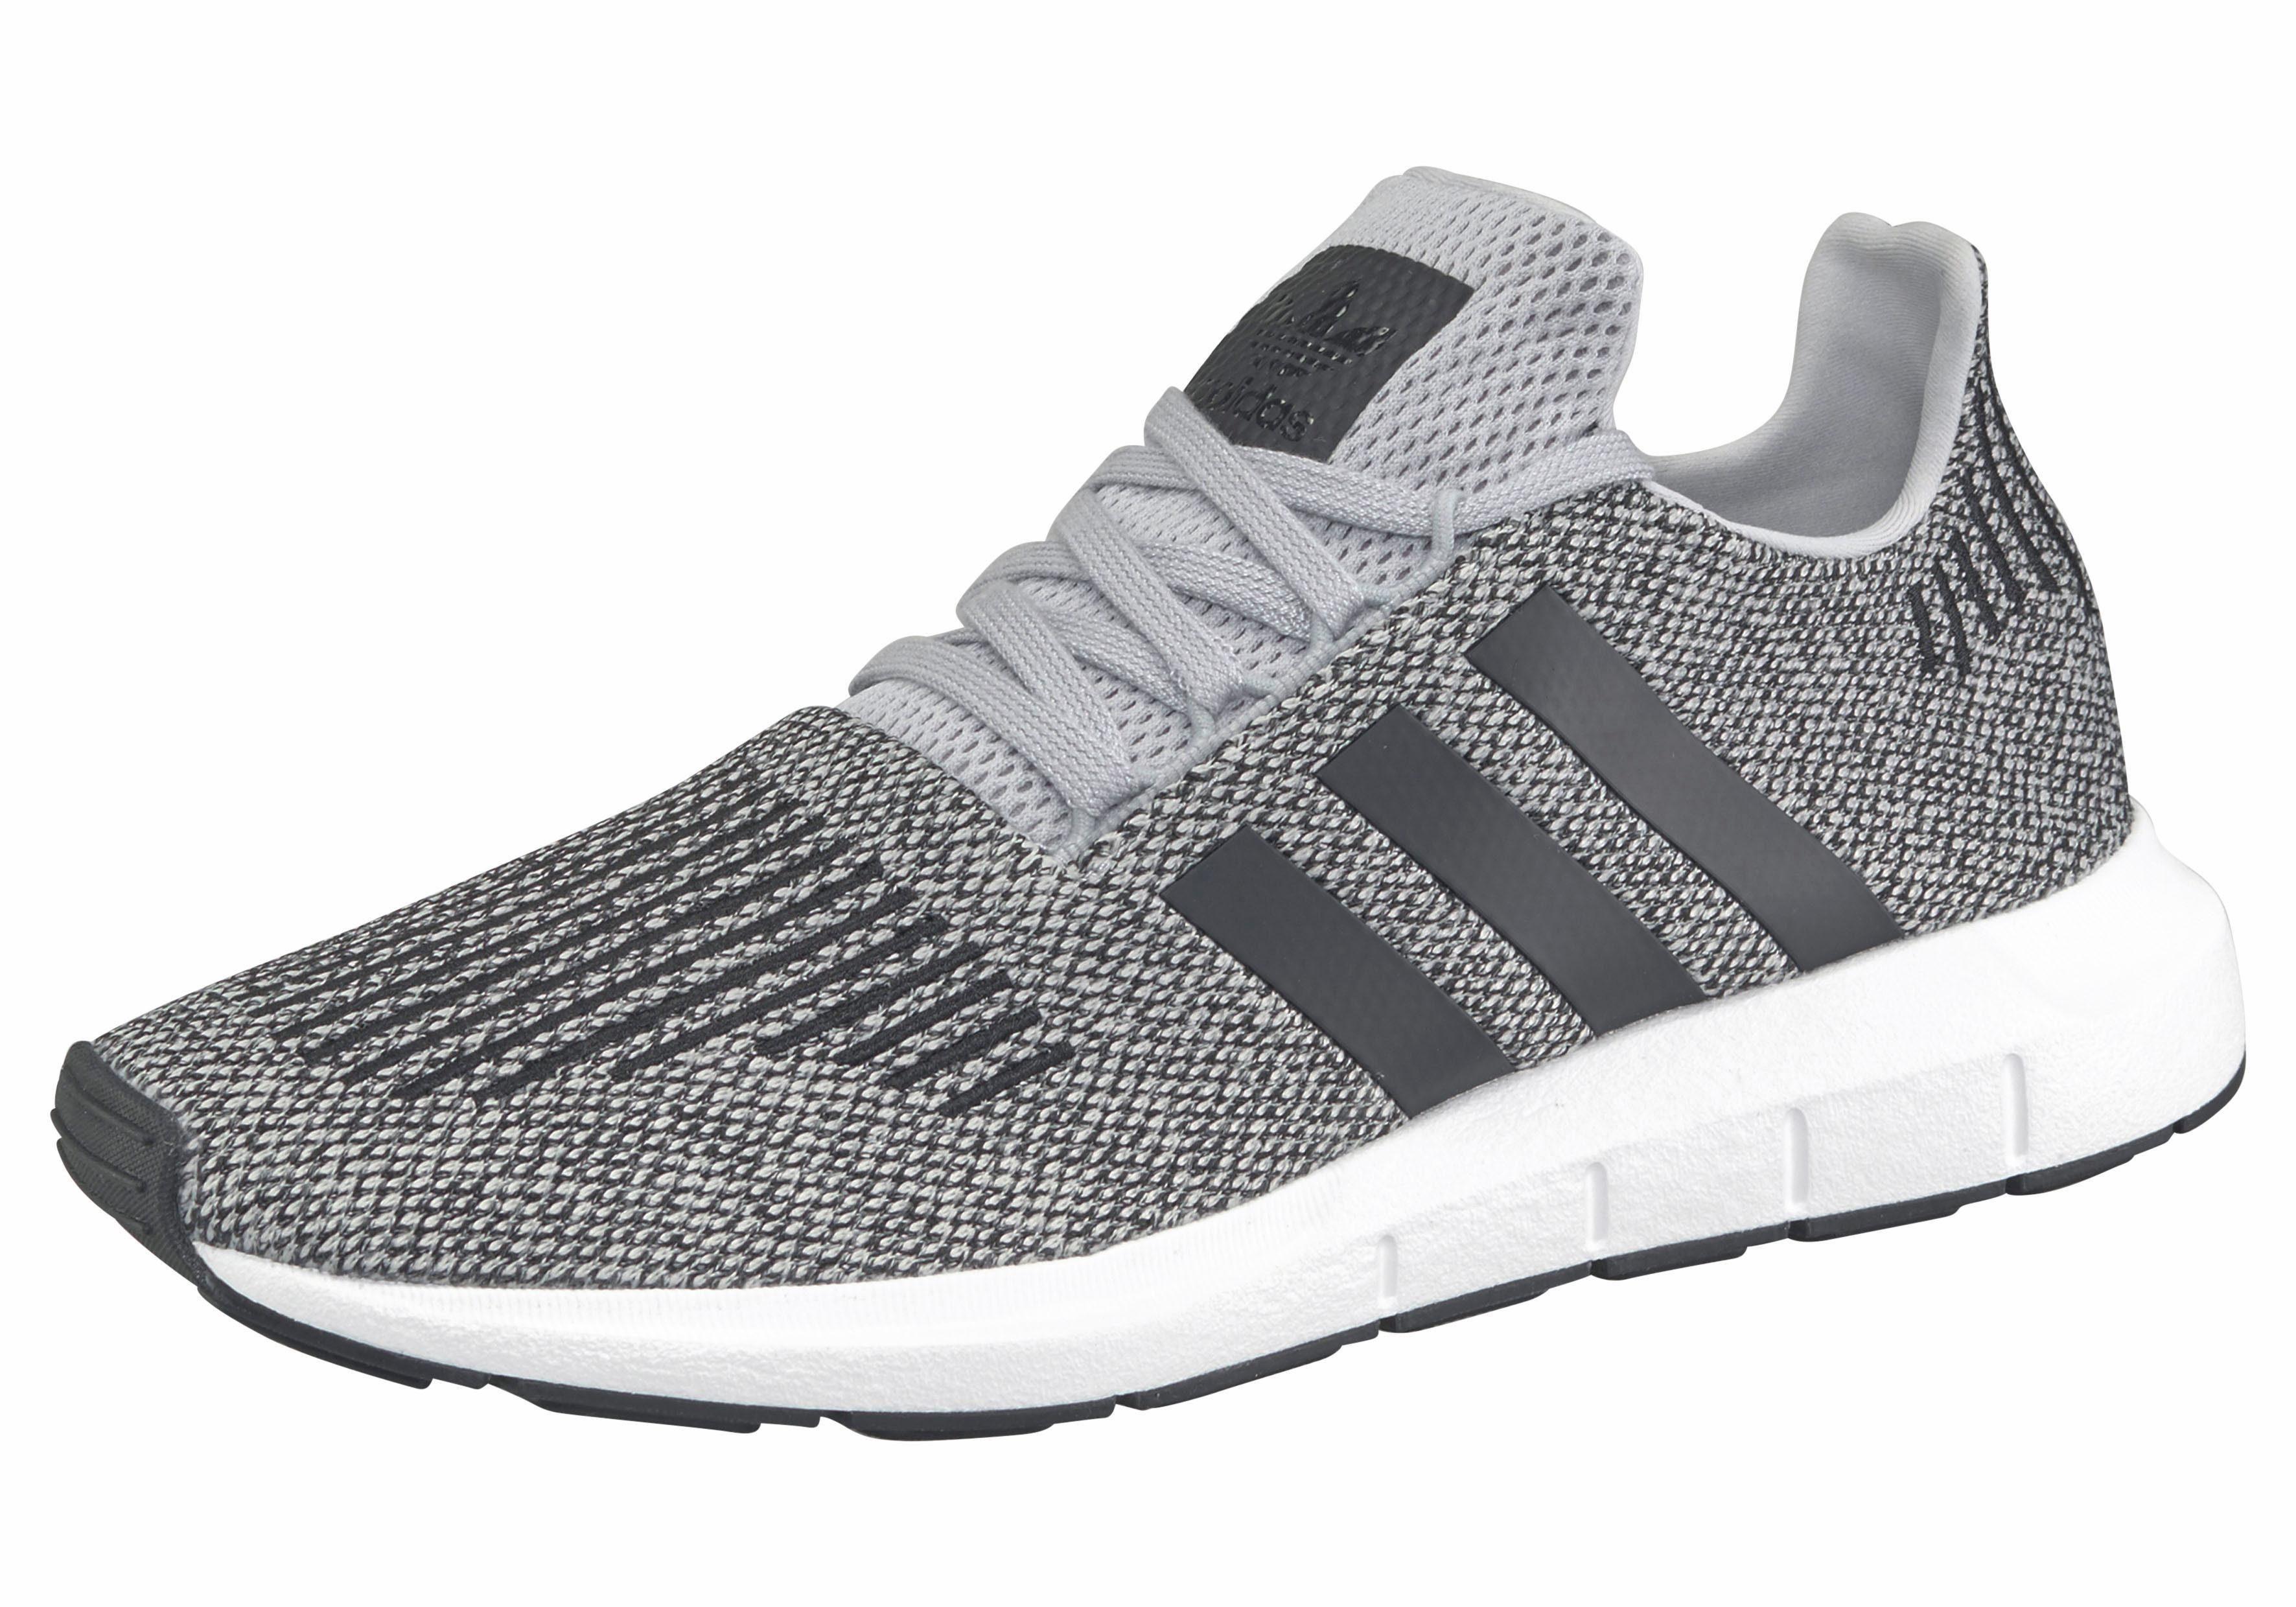 adidas Originals »Swift Run« Sneaker, Atmungsaktives Obermaterial aus Textil online kaufen | OTTO